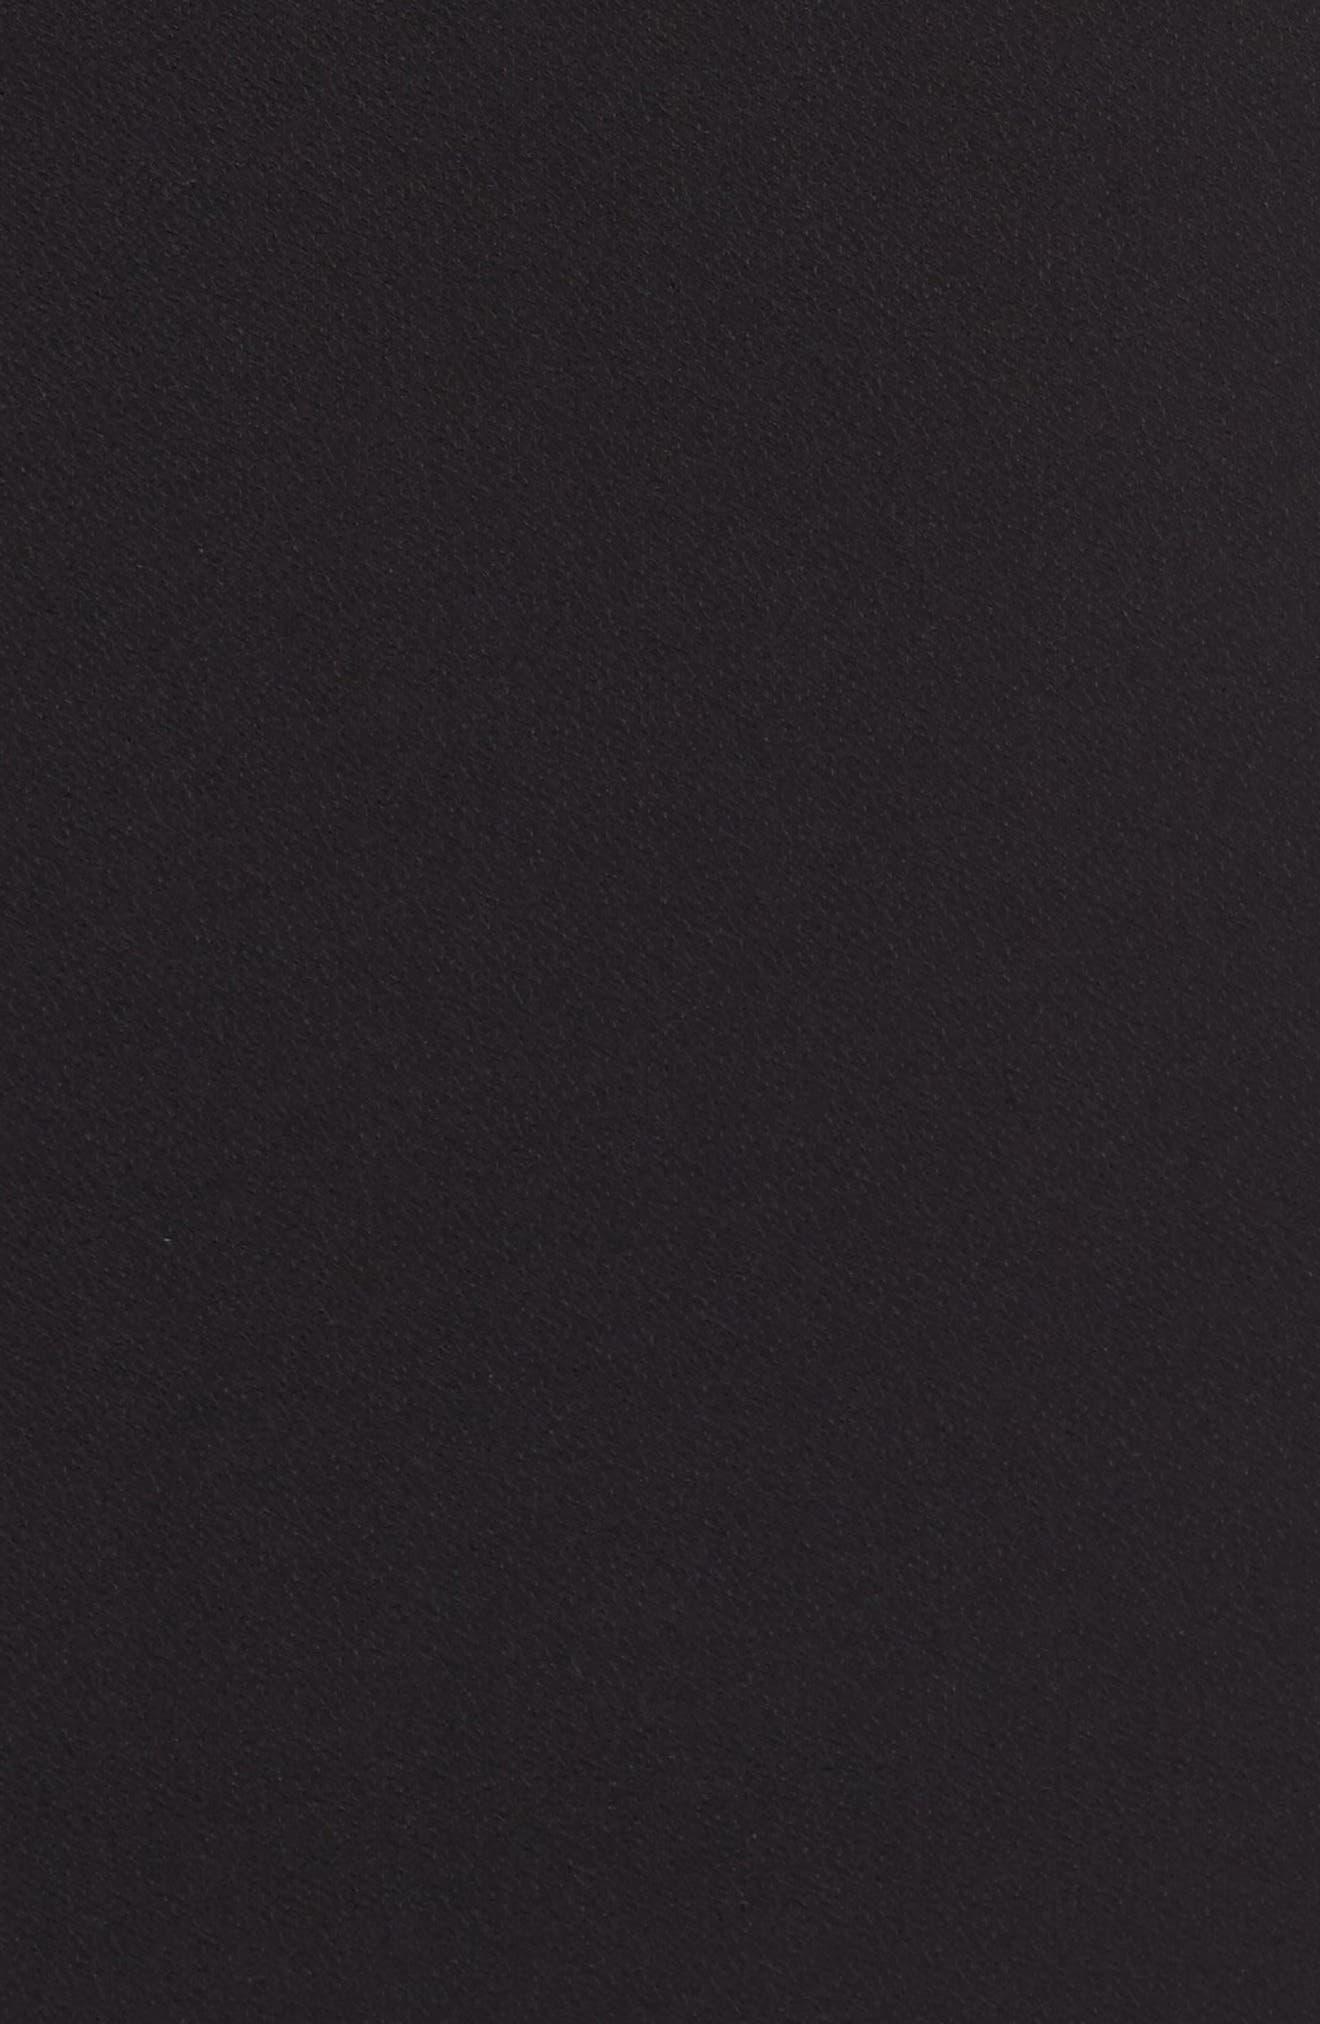 Cutout Shoulder Crepe Sheath Dress,                             Alternate thumbnail 5, color,                             Black